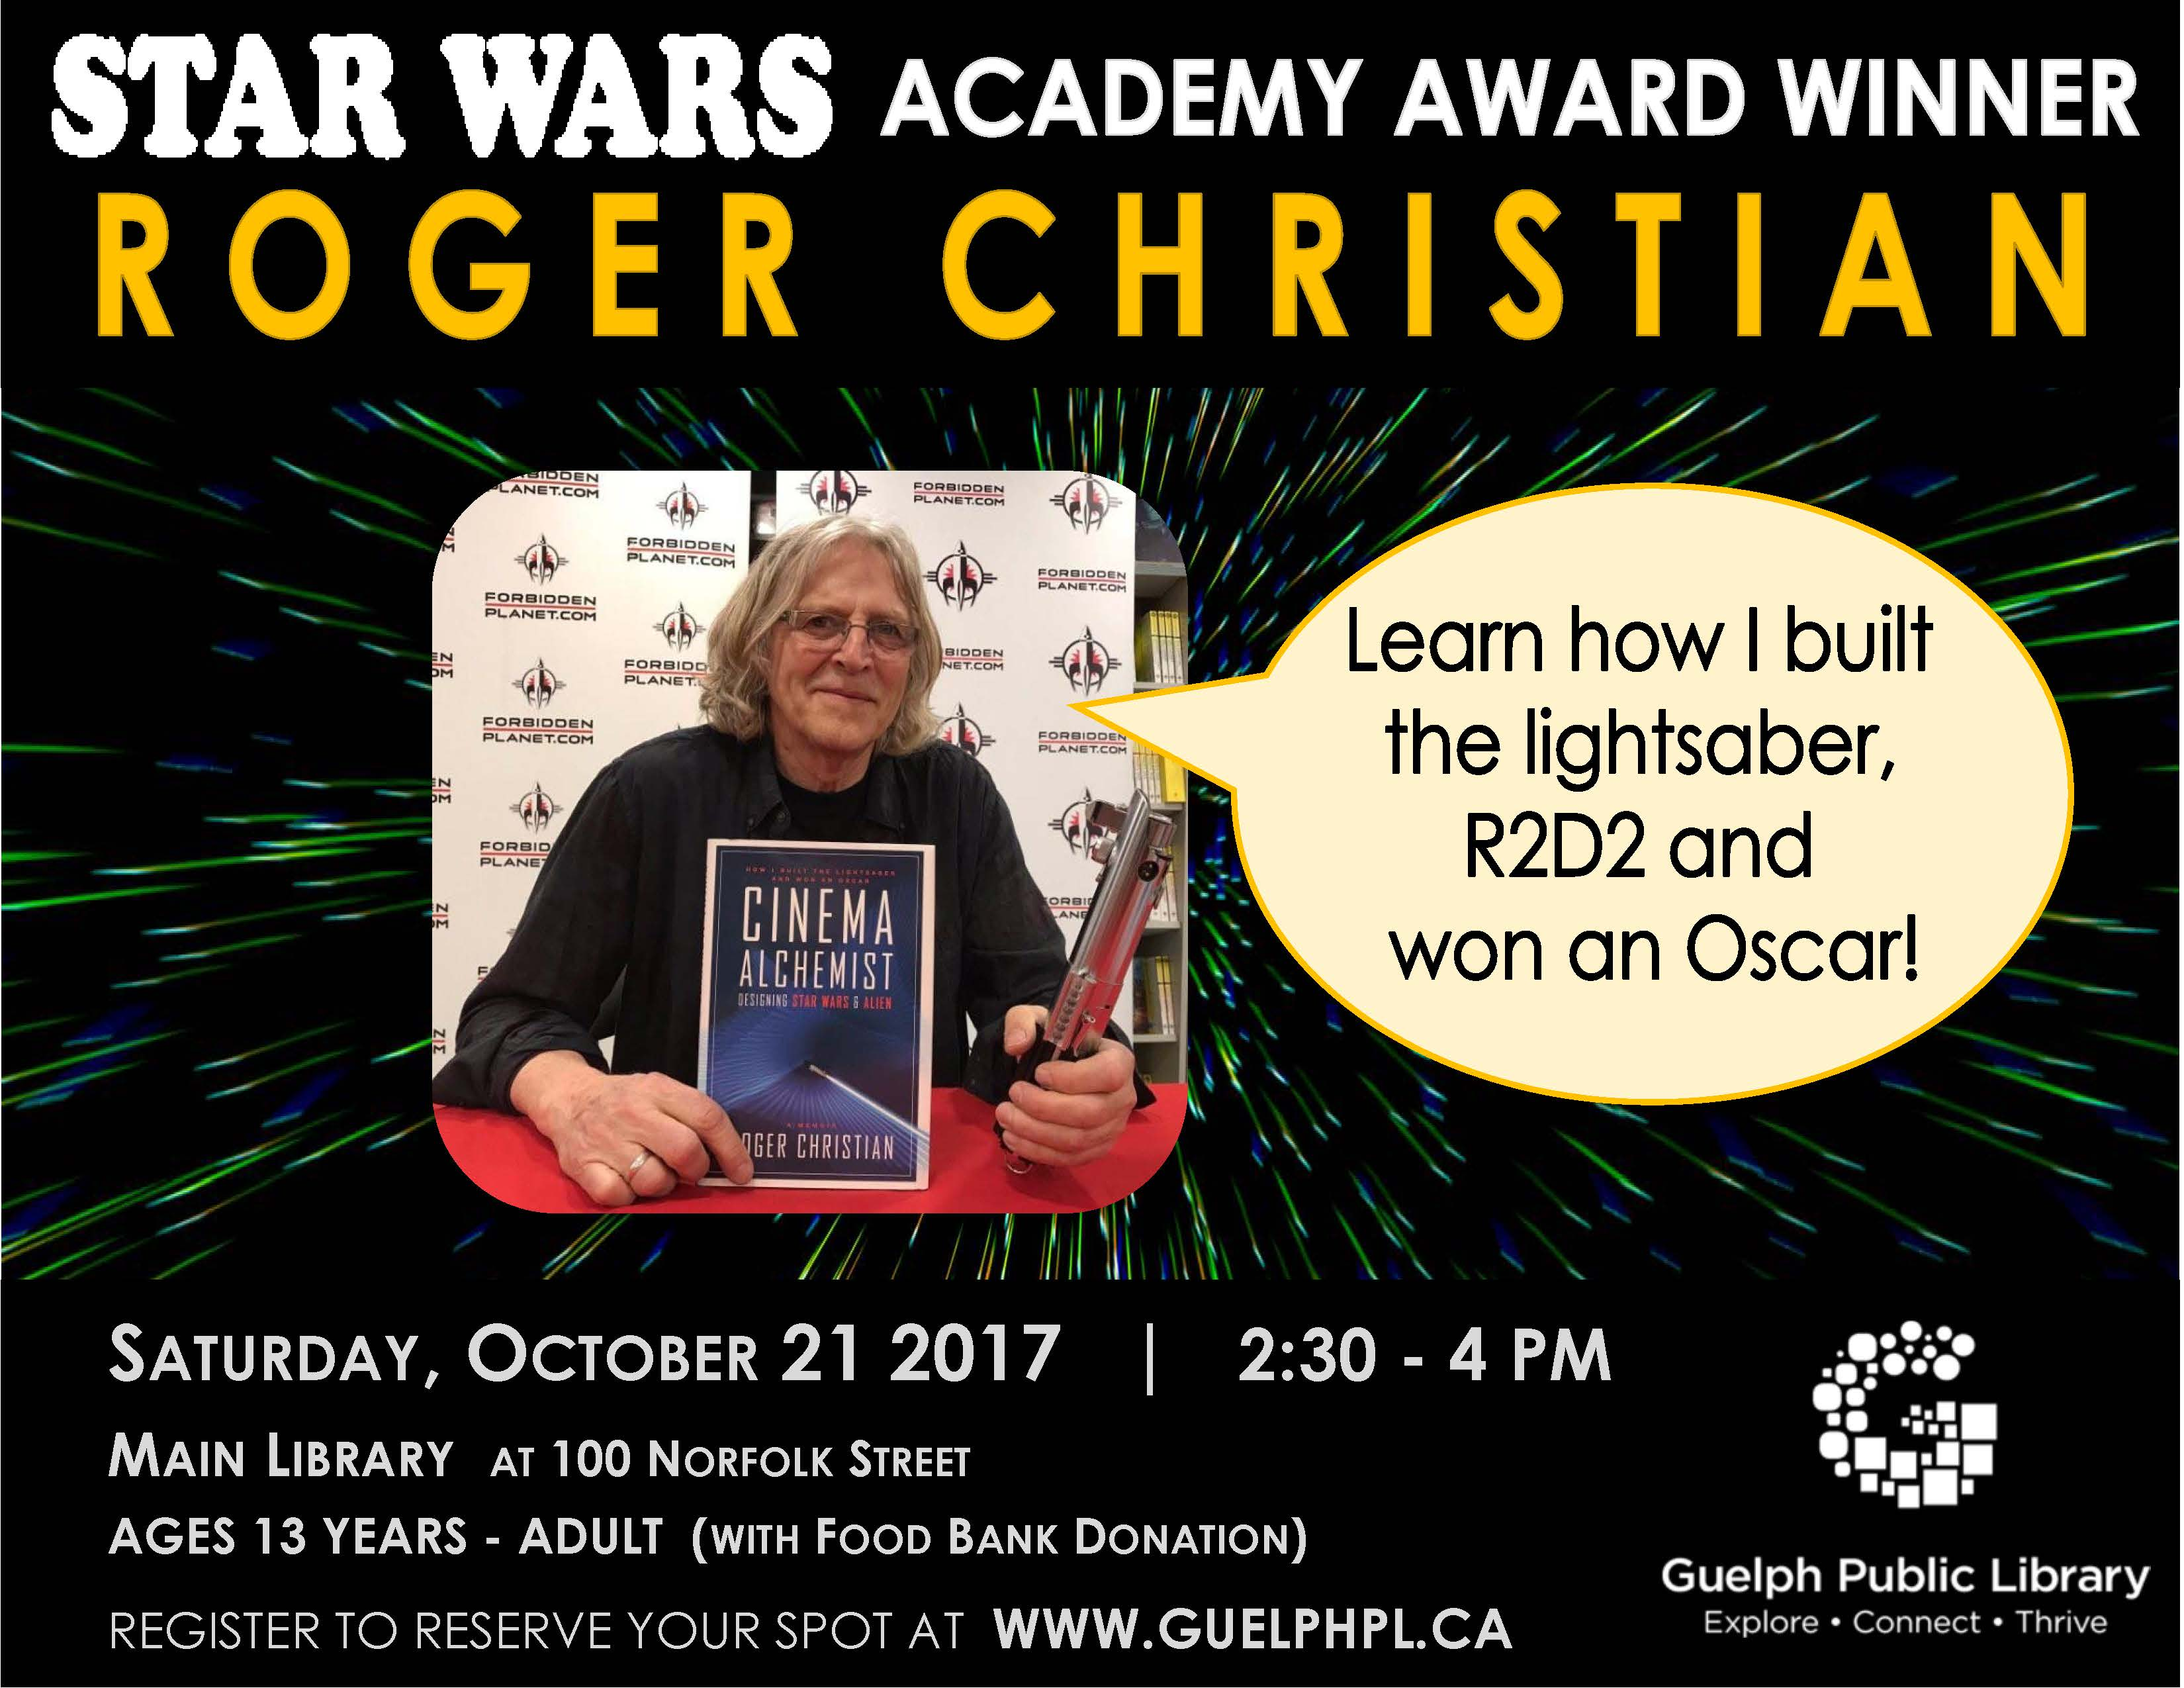 Meet Roger Christian, Star Wars Set decorator